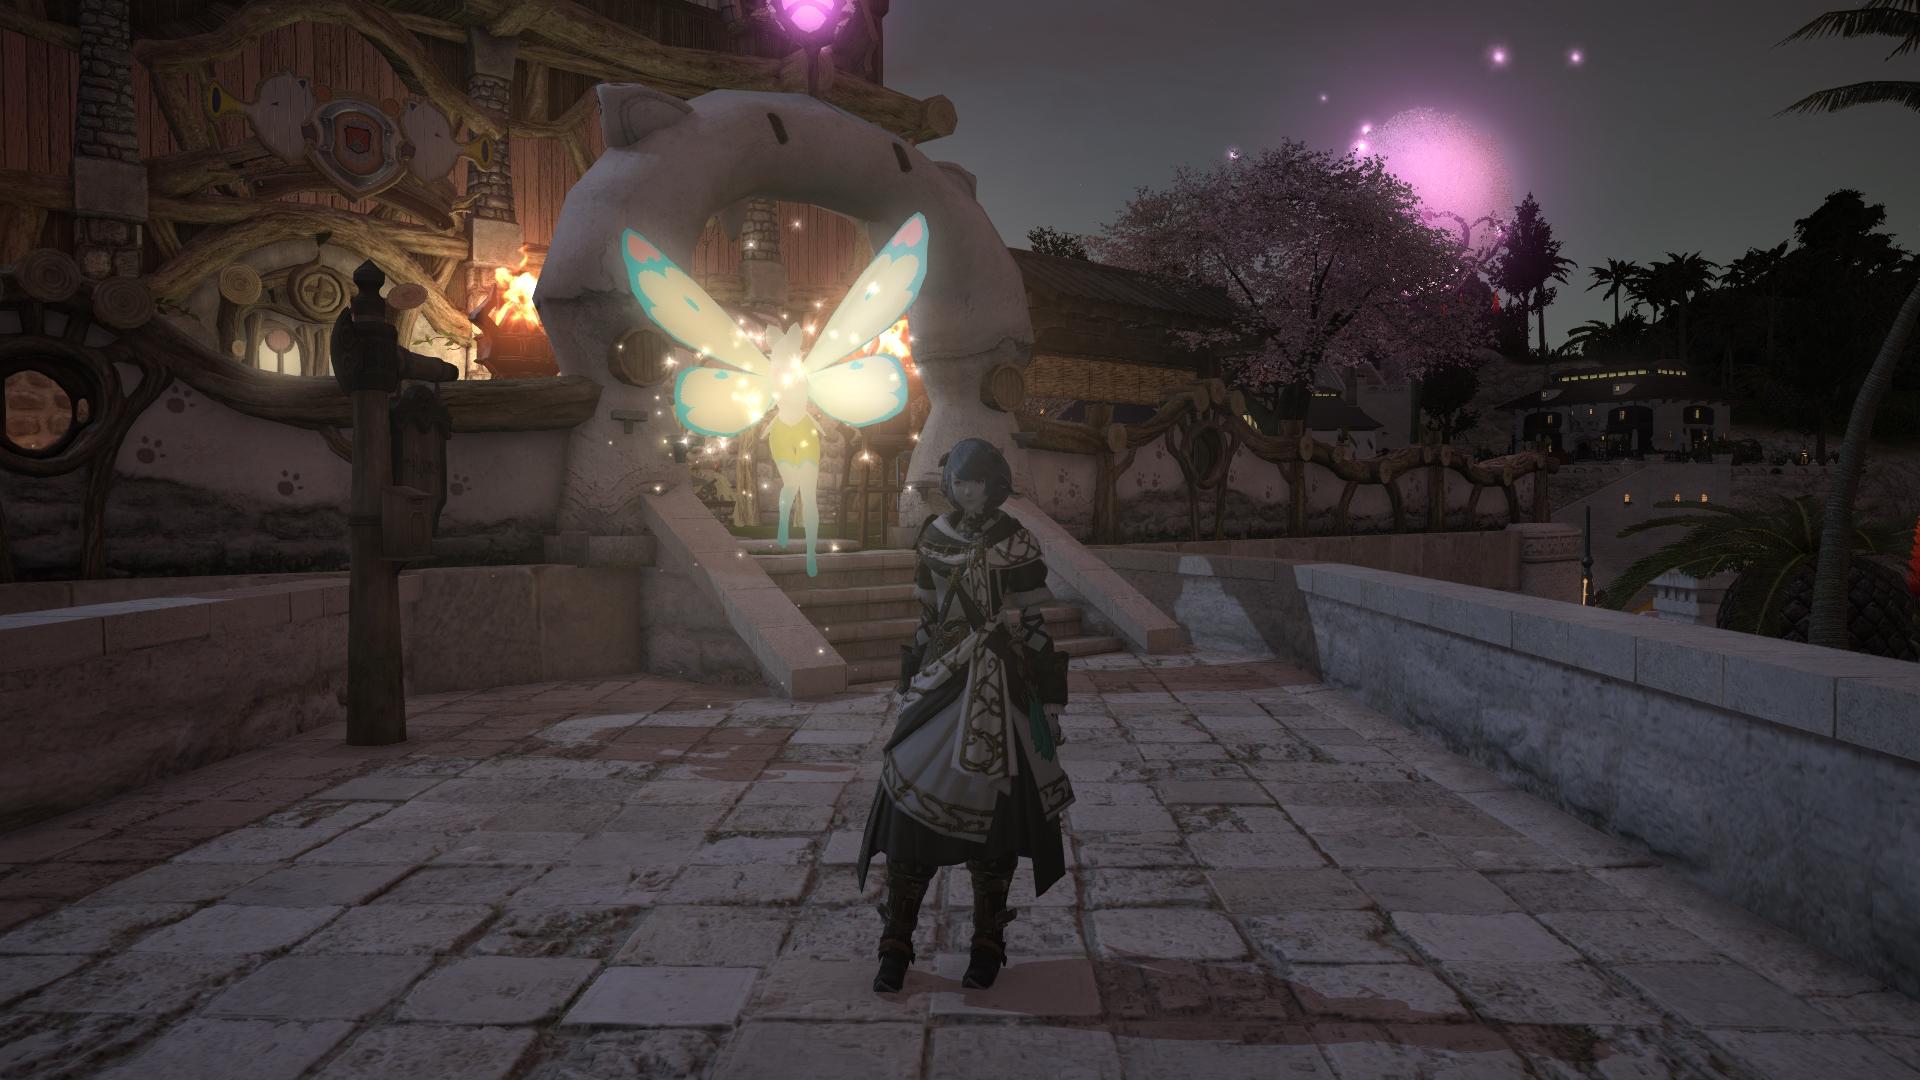 Final Fantasy XIV OnRPG